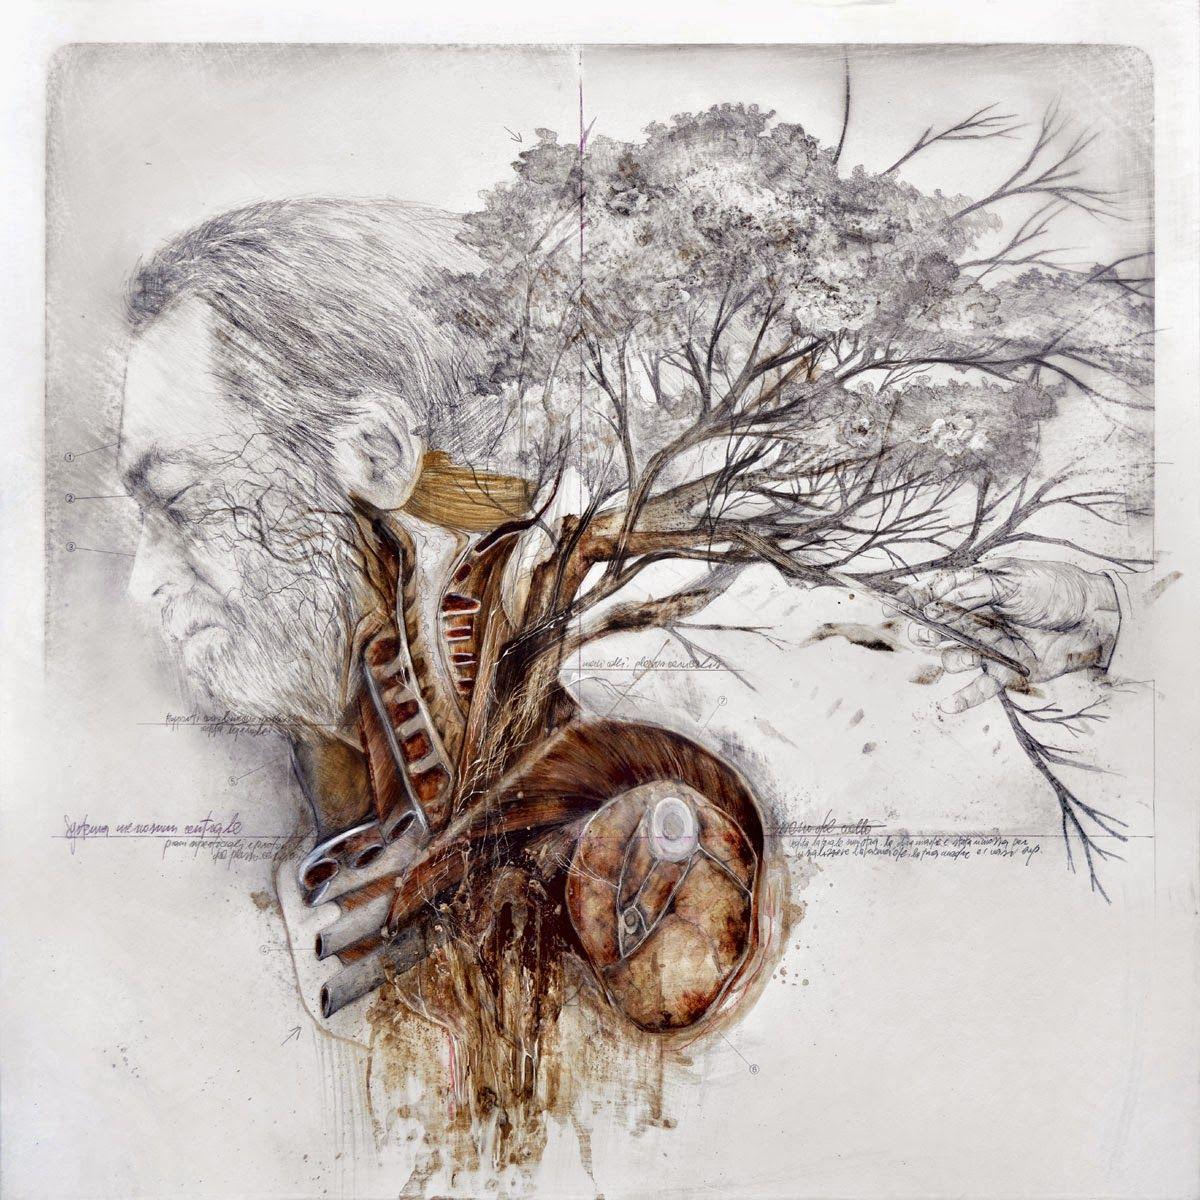 Title: Melancholy of the soil / Malinconia della terra Dim: cm ...